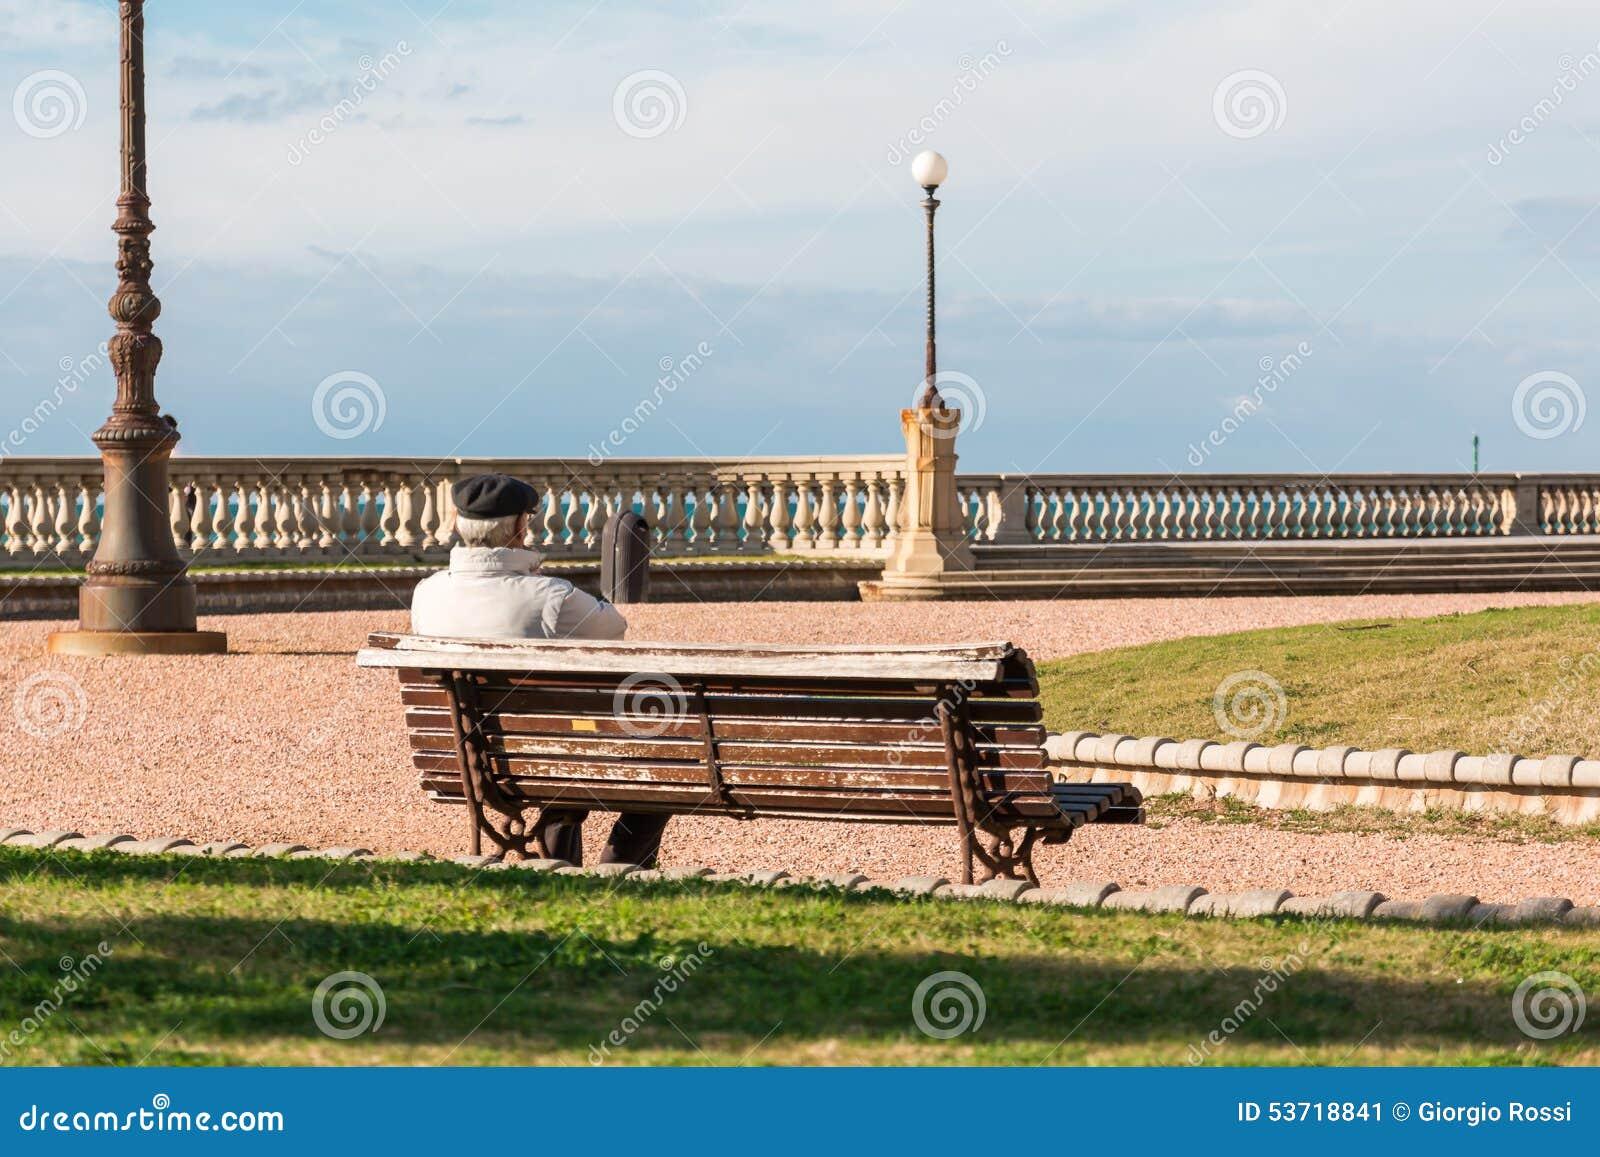 terrace park single men Single adults - transitional shelter/housing  (men) 4200 butterworth terrace, nw (202)  park road transitional (men) 1318 park road, nw (202).